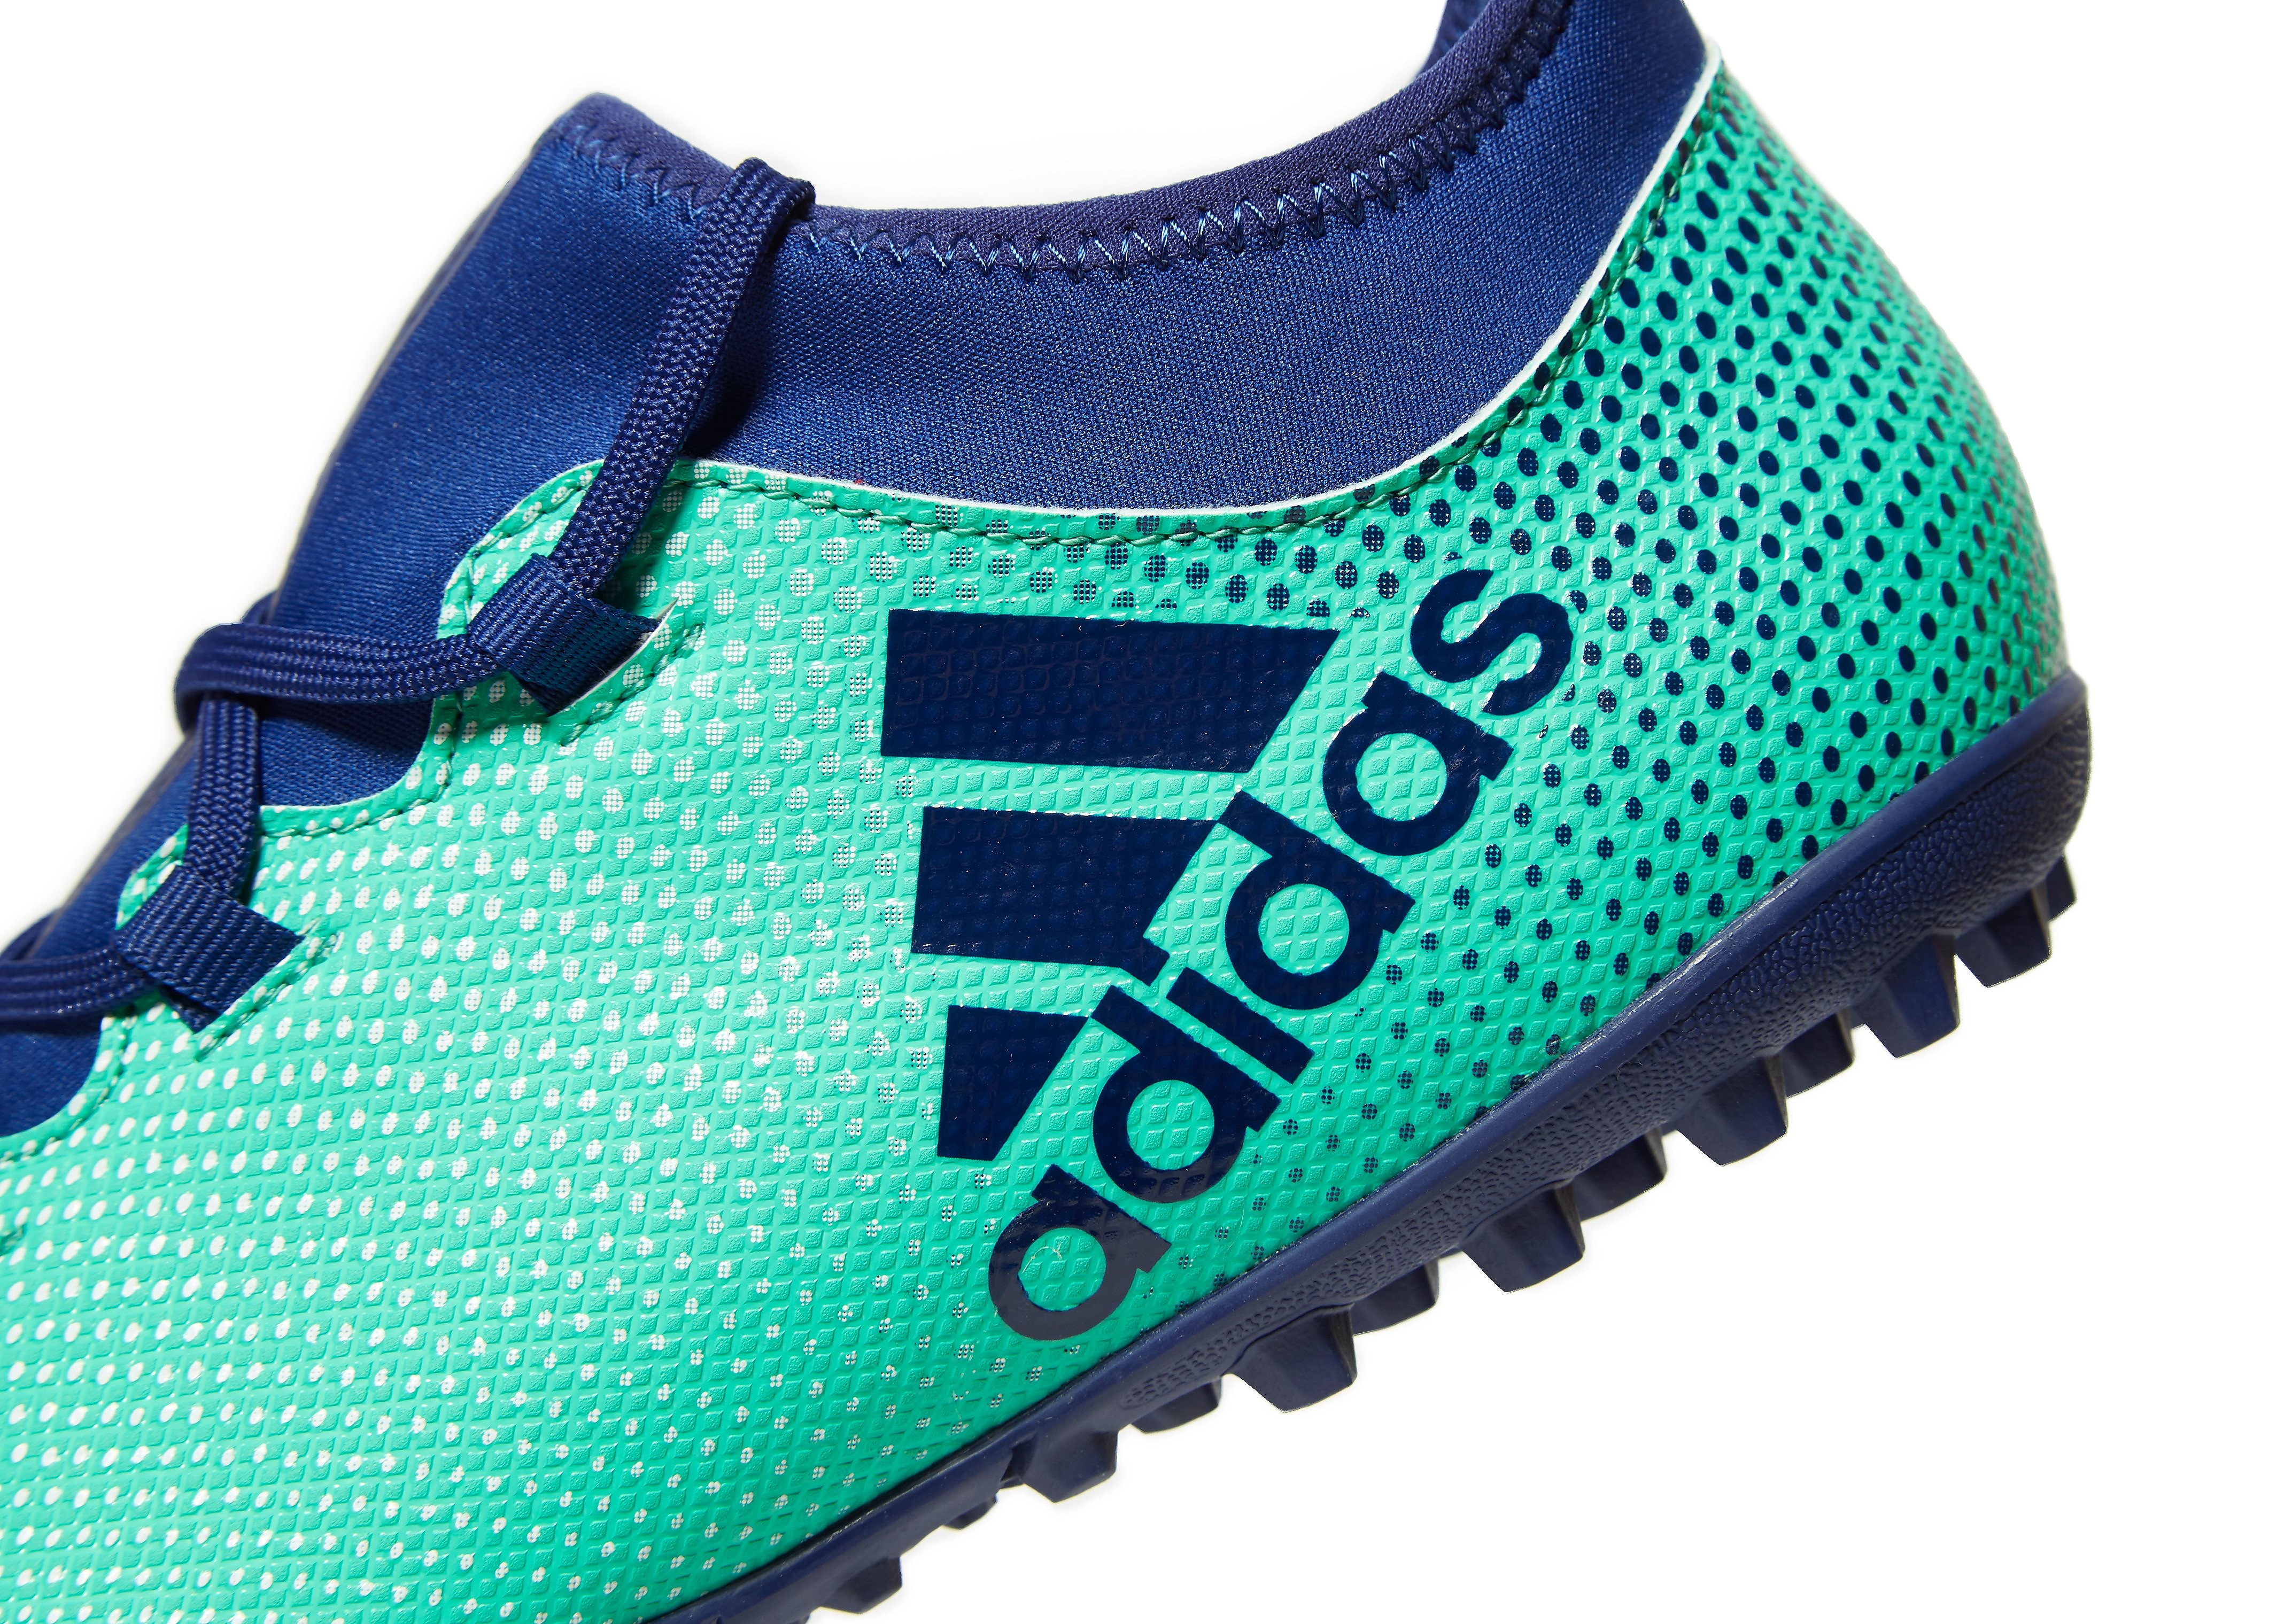 adidas Deadly Strike X 17.3 TF